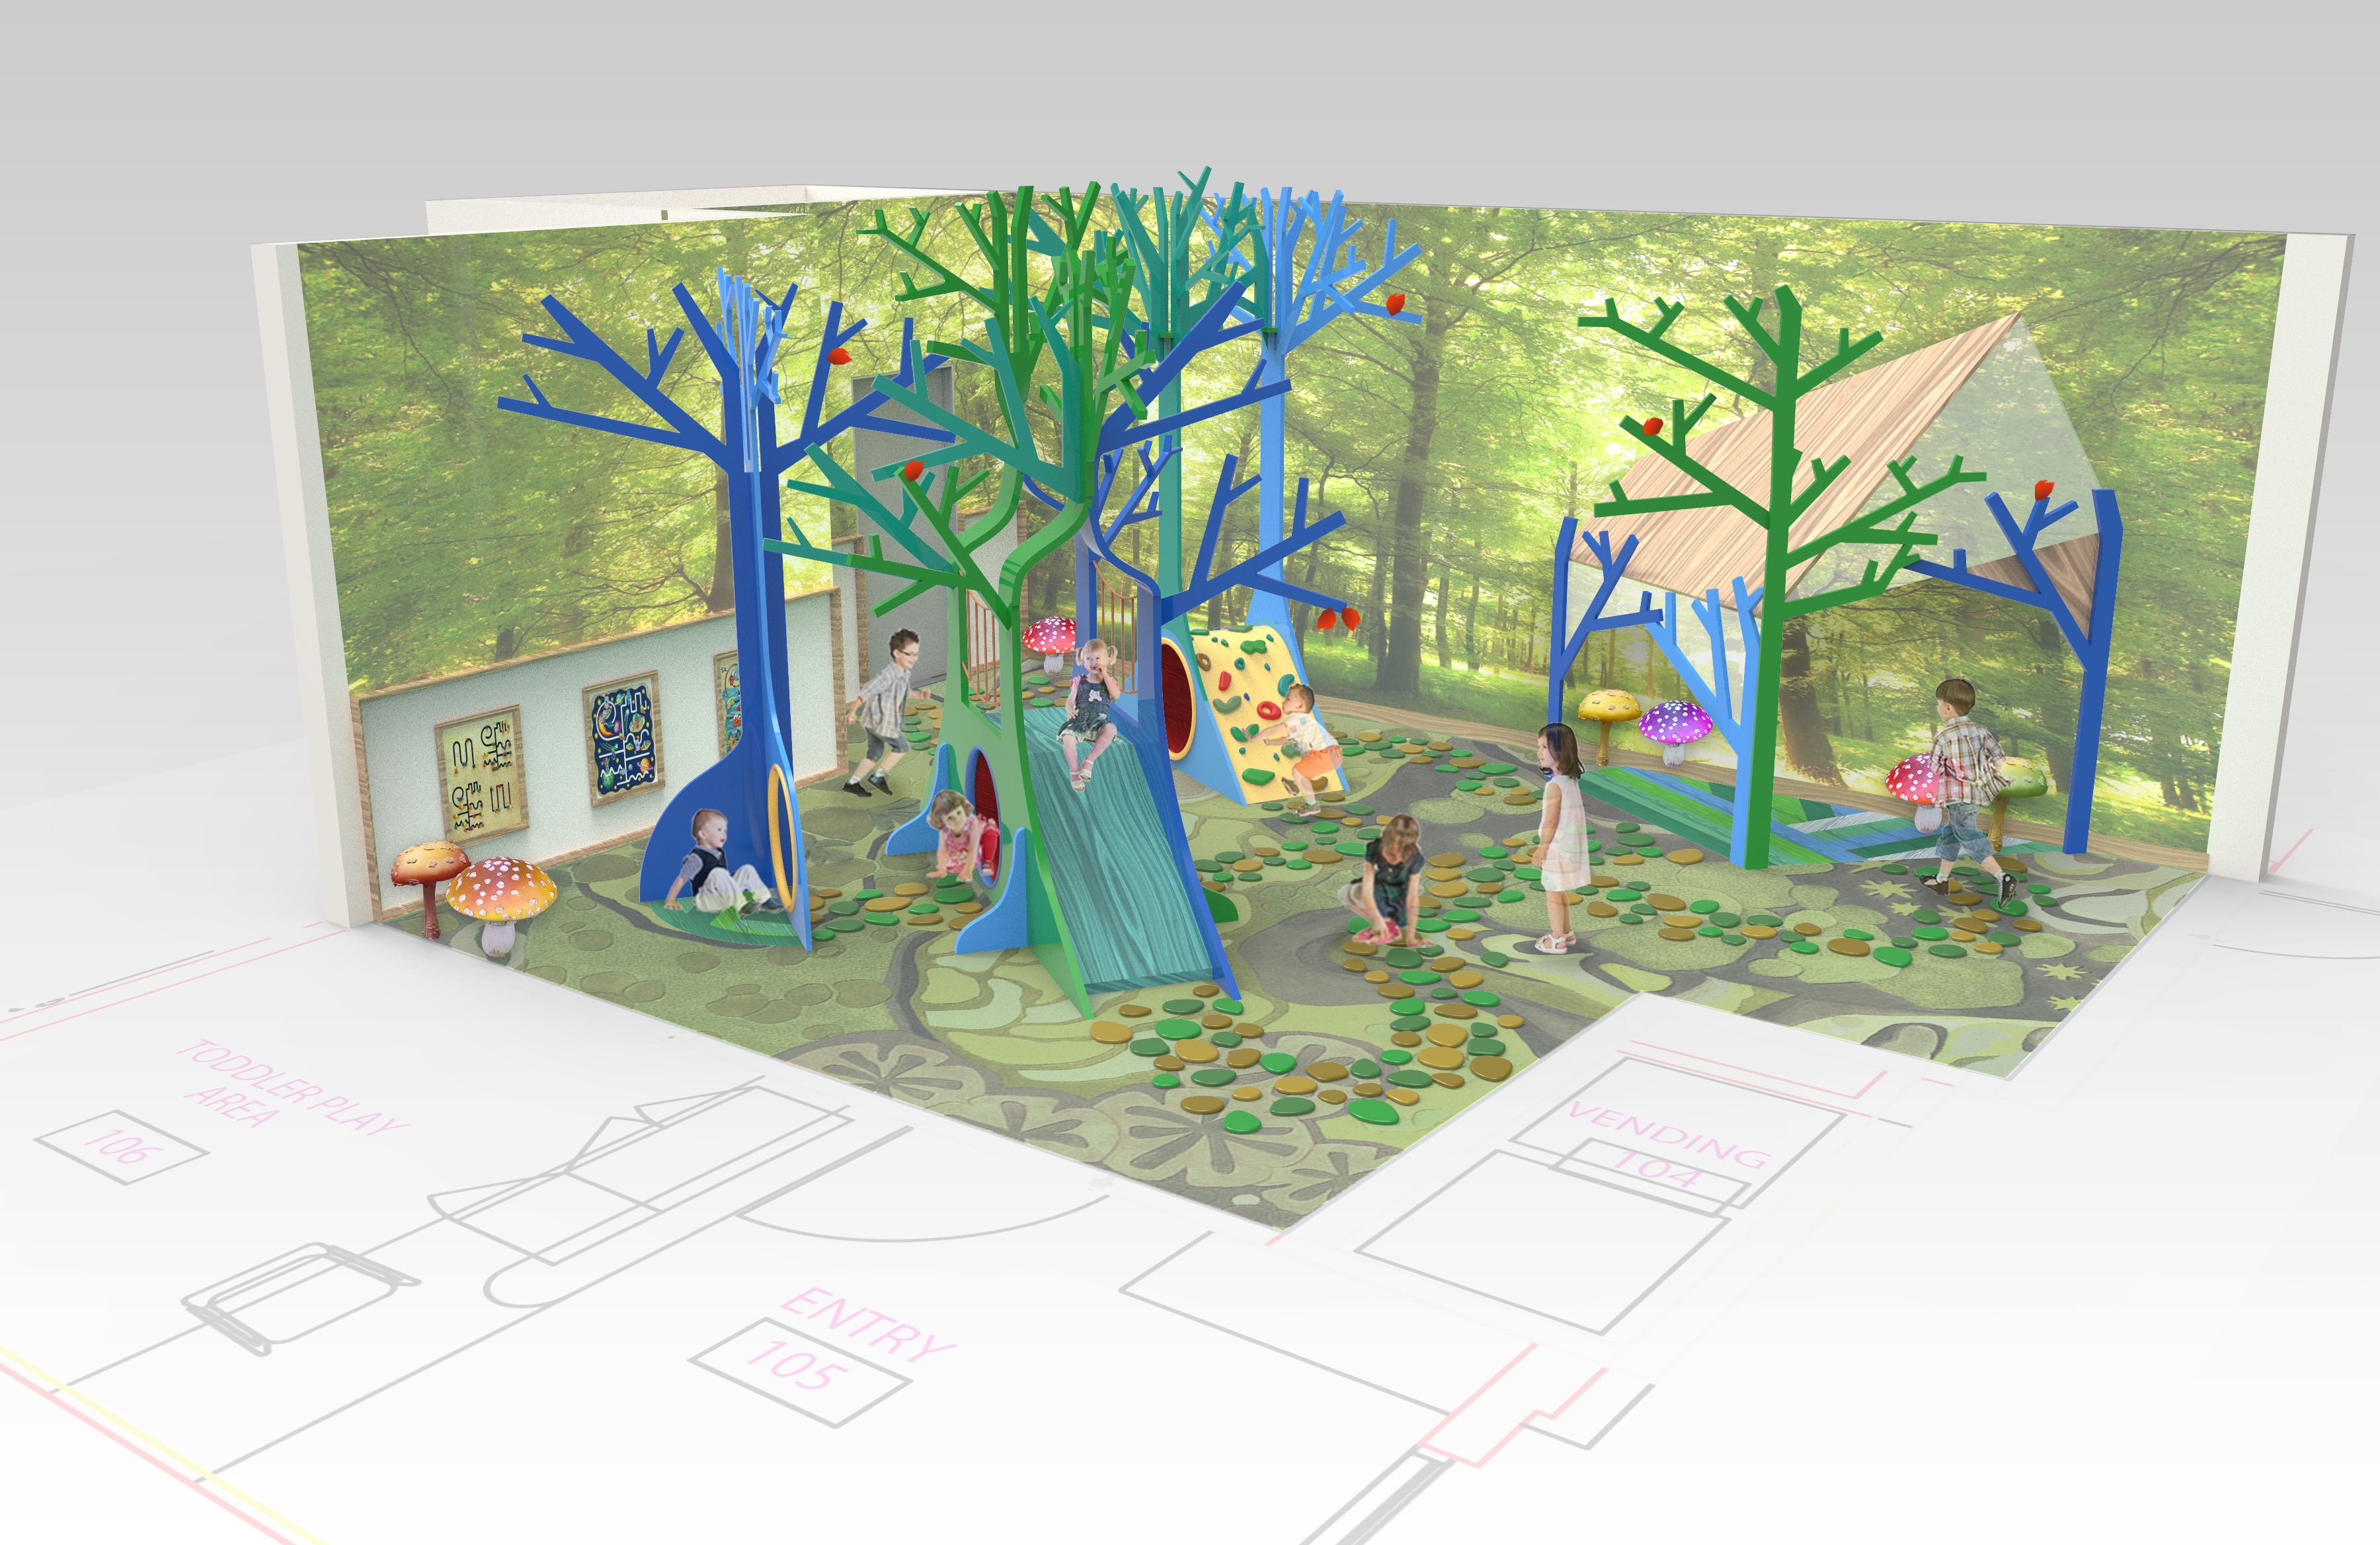 Tree Forest Playarea 3d Rendering